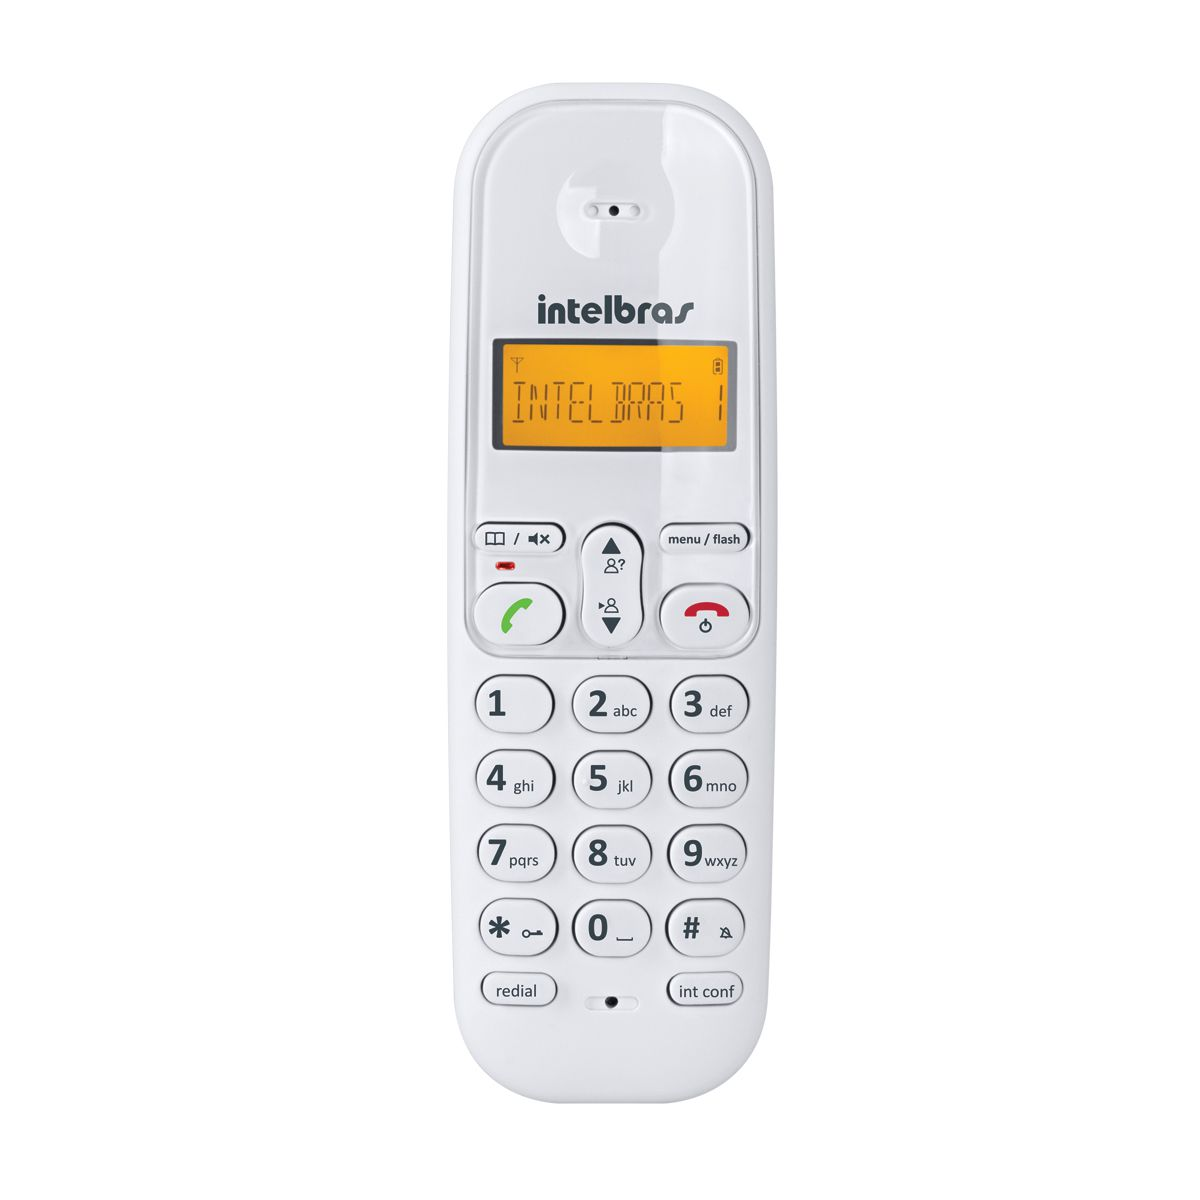 Telefone S/Fio TS-3110 Branco Digital Intelbras